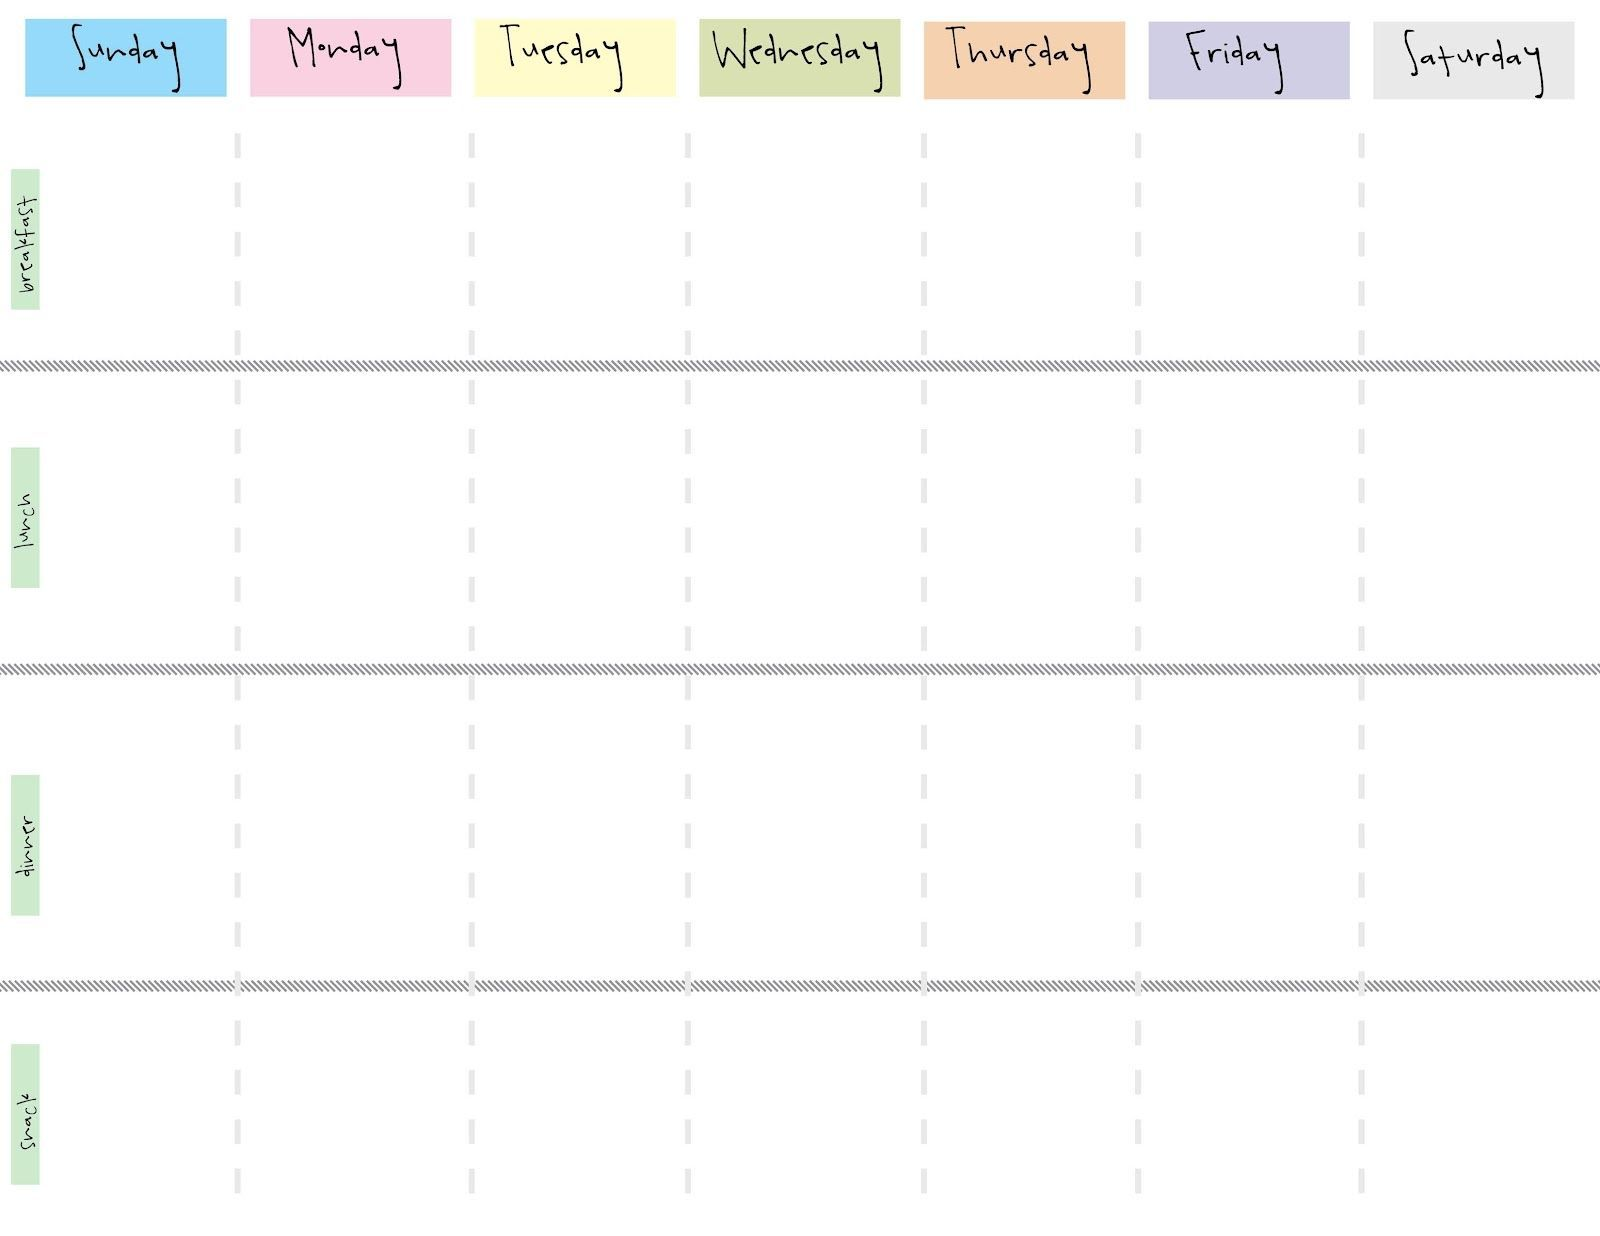 000 Wonderful Printable Weekly Planner Template Cute Photo  Free CalendarFull